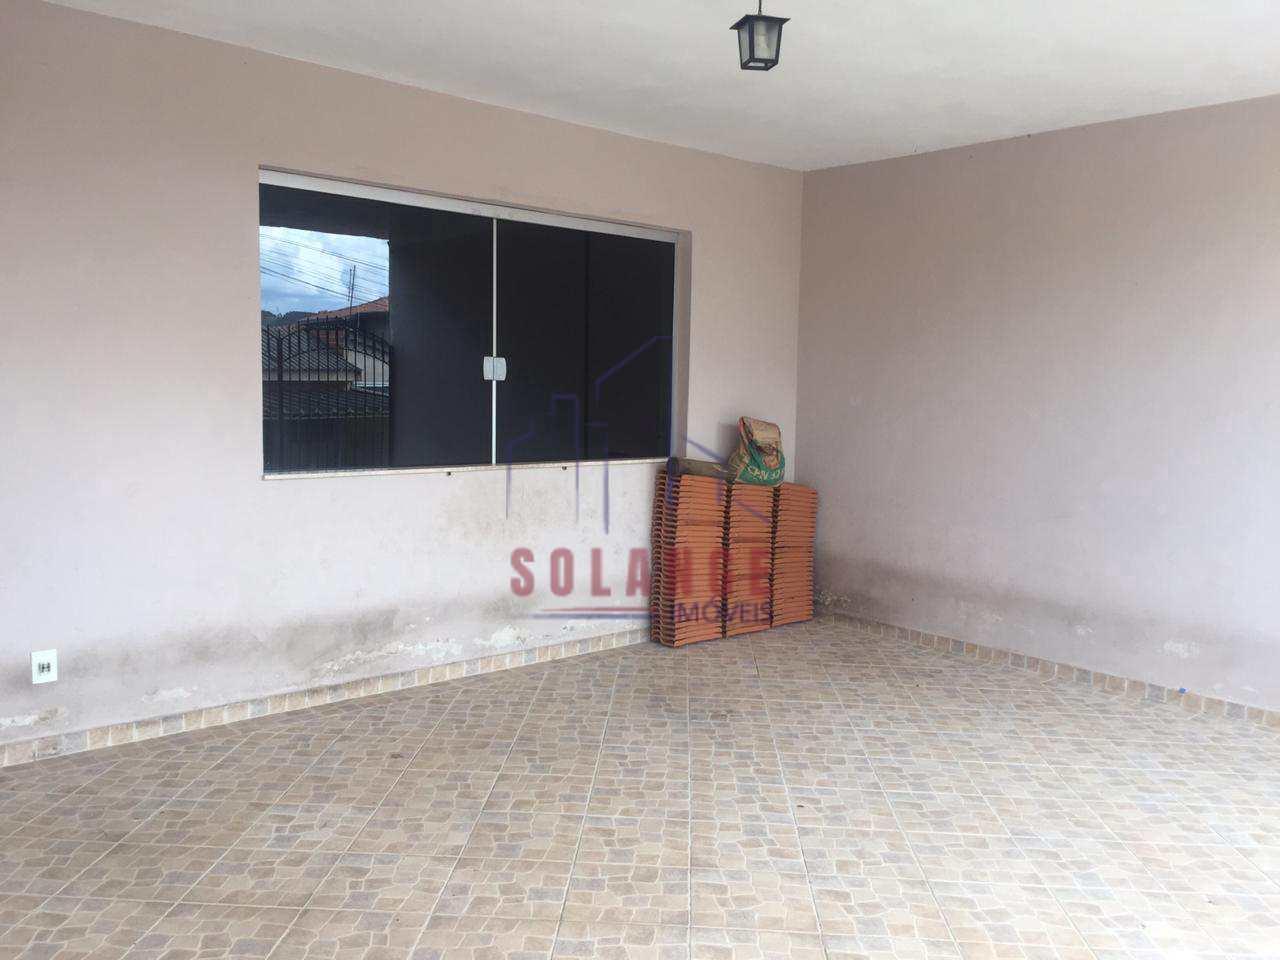 Casa com 3 dorms, Residencial Santa Maria Amparo, Amparo - R$ 400 mil, Cod: 2216